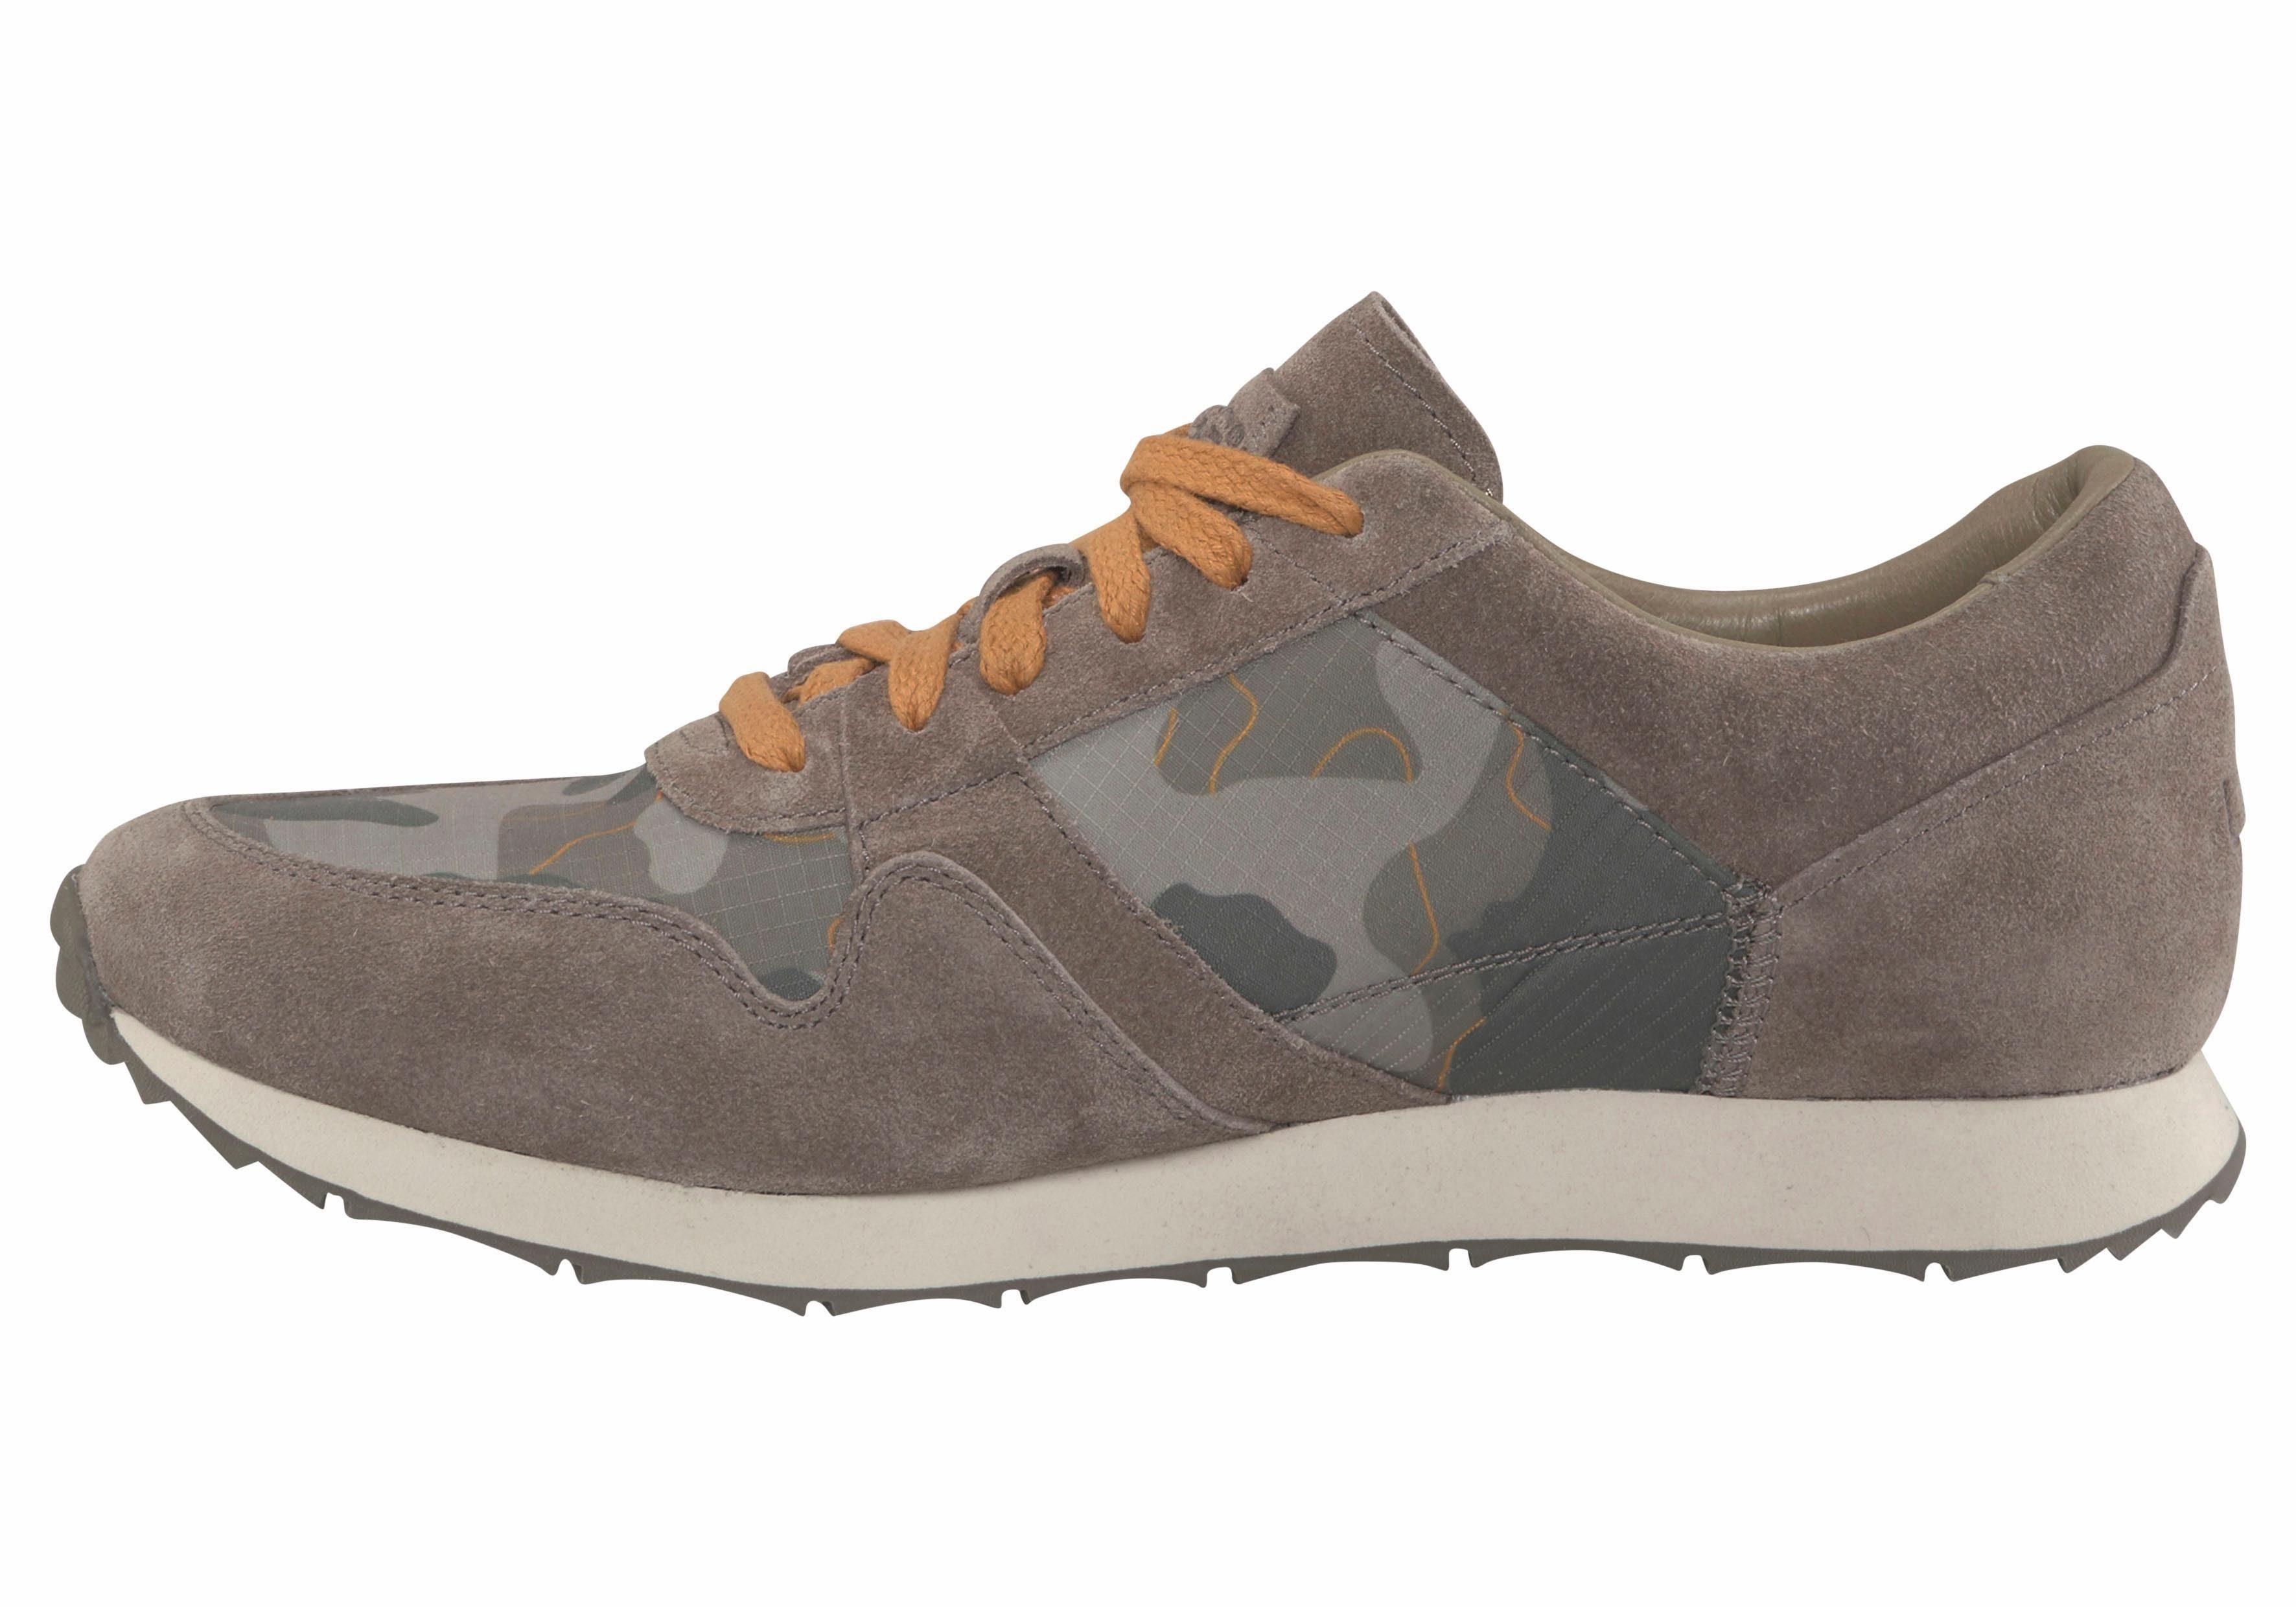 Mustermix Sneaker Im Material »trigo« Und Ugg X8CxwTq5